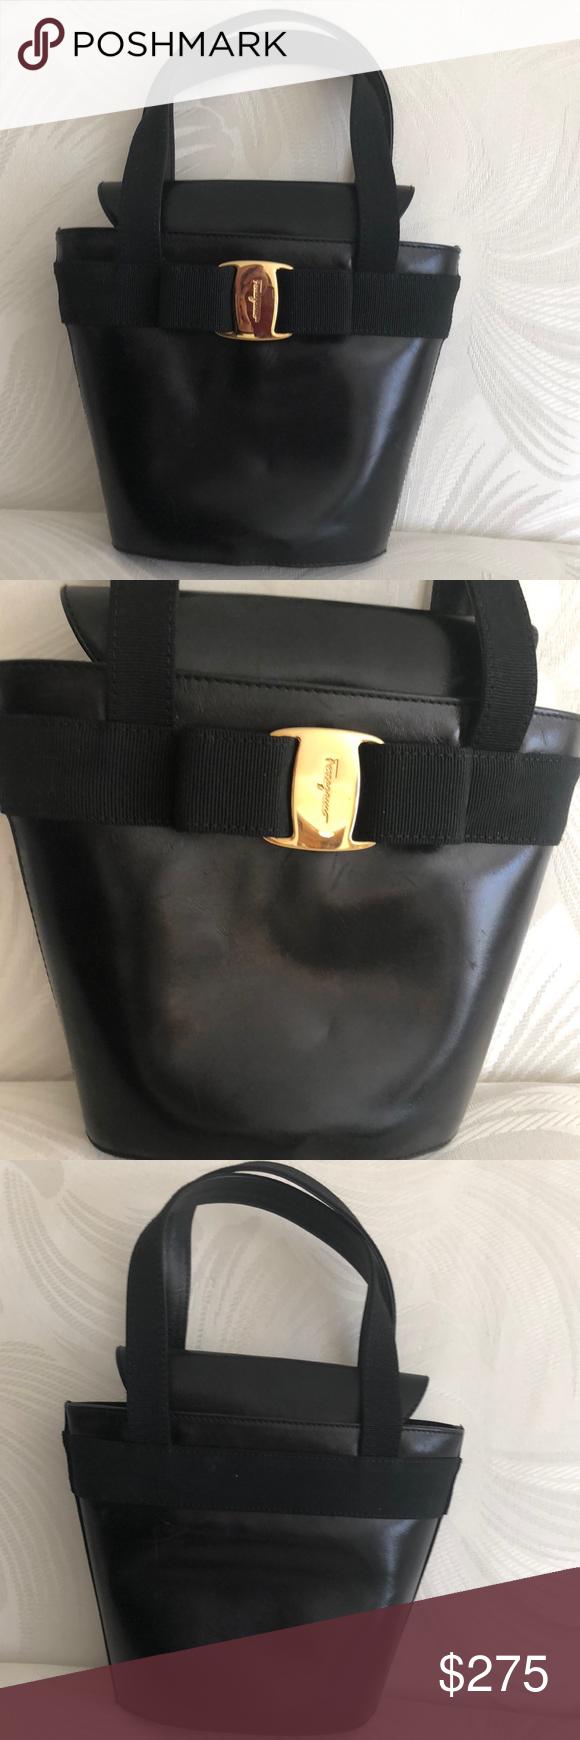 3511bb867b3 Salvatore Ferragamo Vara Bow Black Leather Handbag This Salvatore Ferragamo  Vara Bow Black Leather Hand Bag